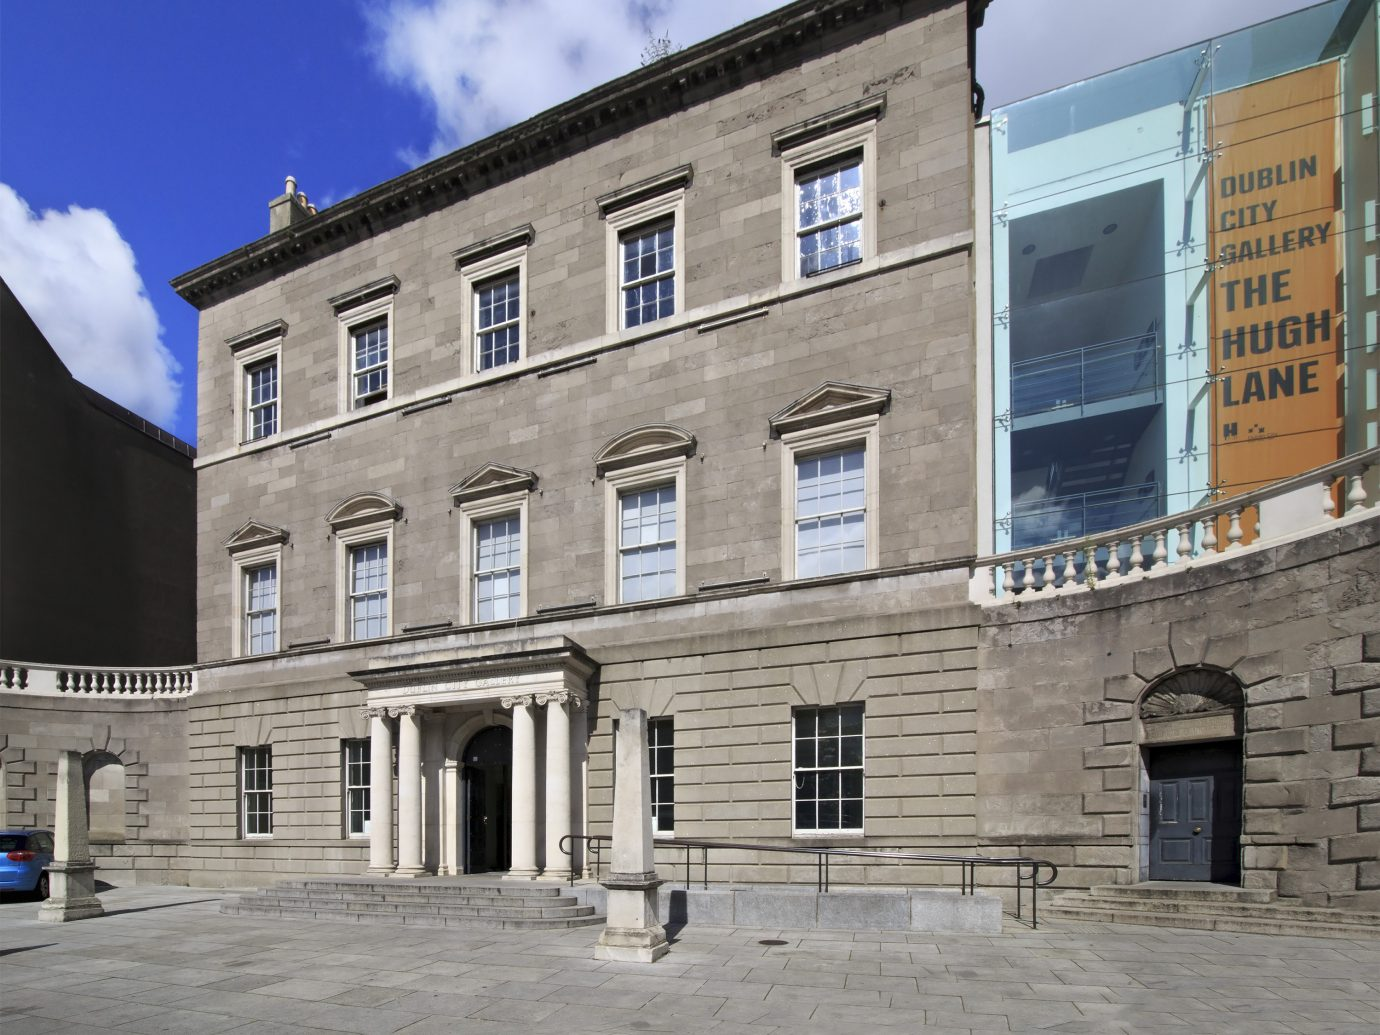 Dublin City Gallery. The Hugh Lane